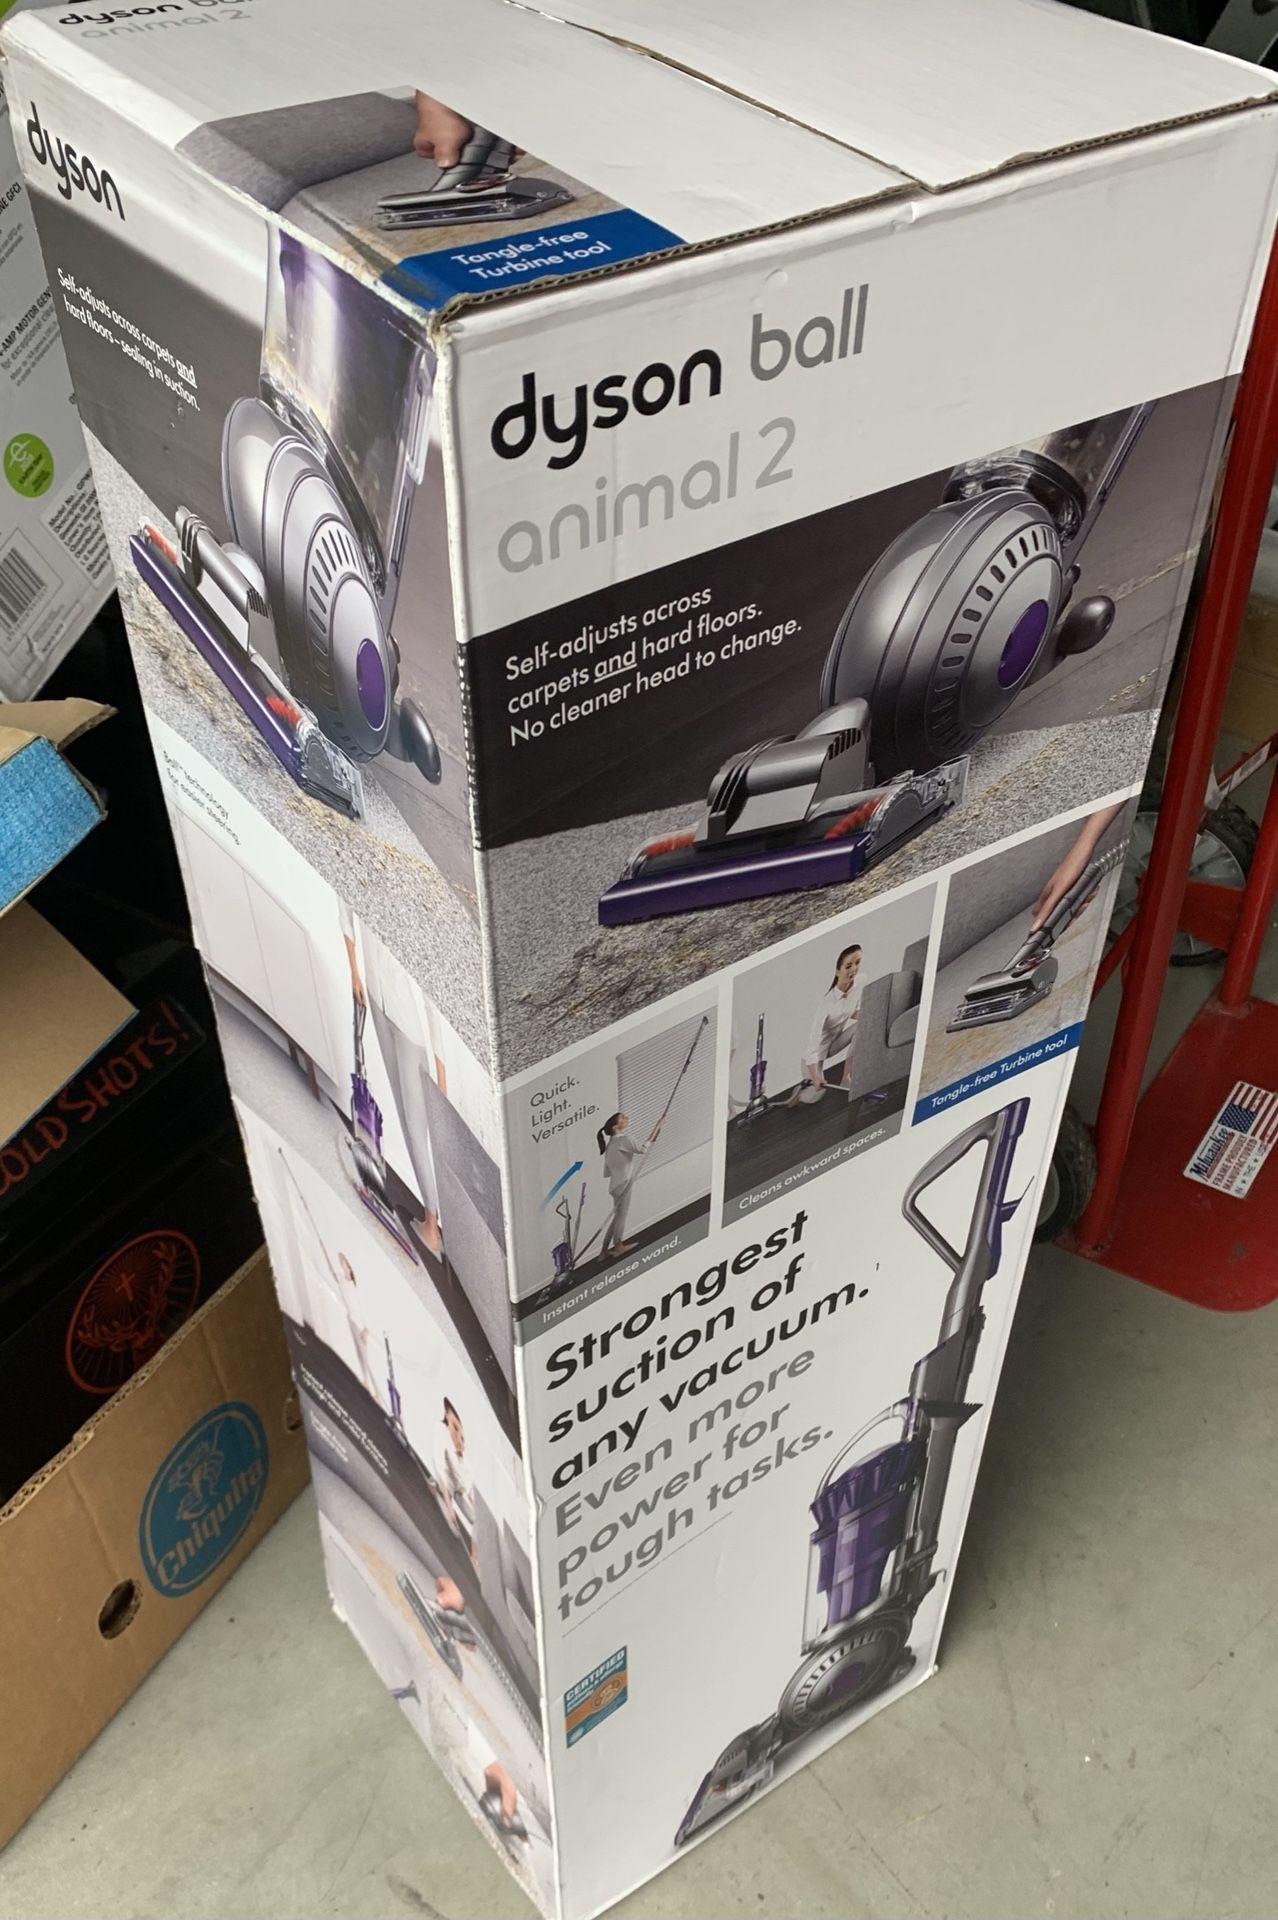 Dyson Ball Animal 2 pet vacuum cleaner